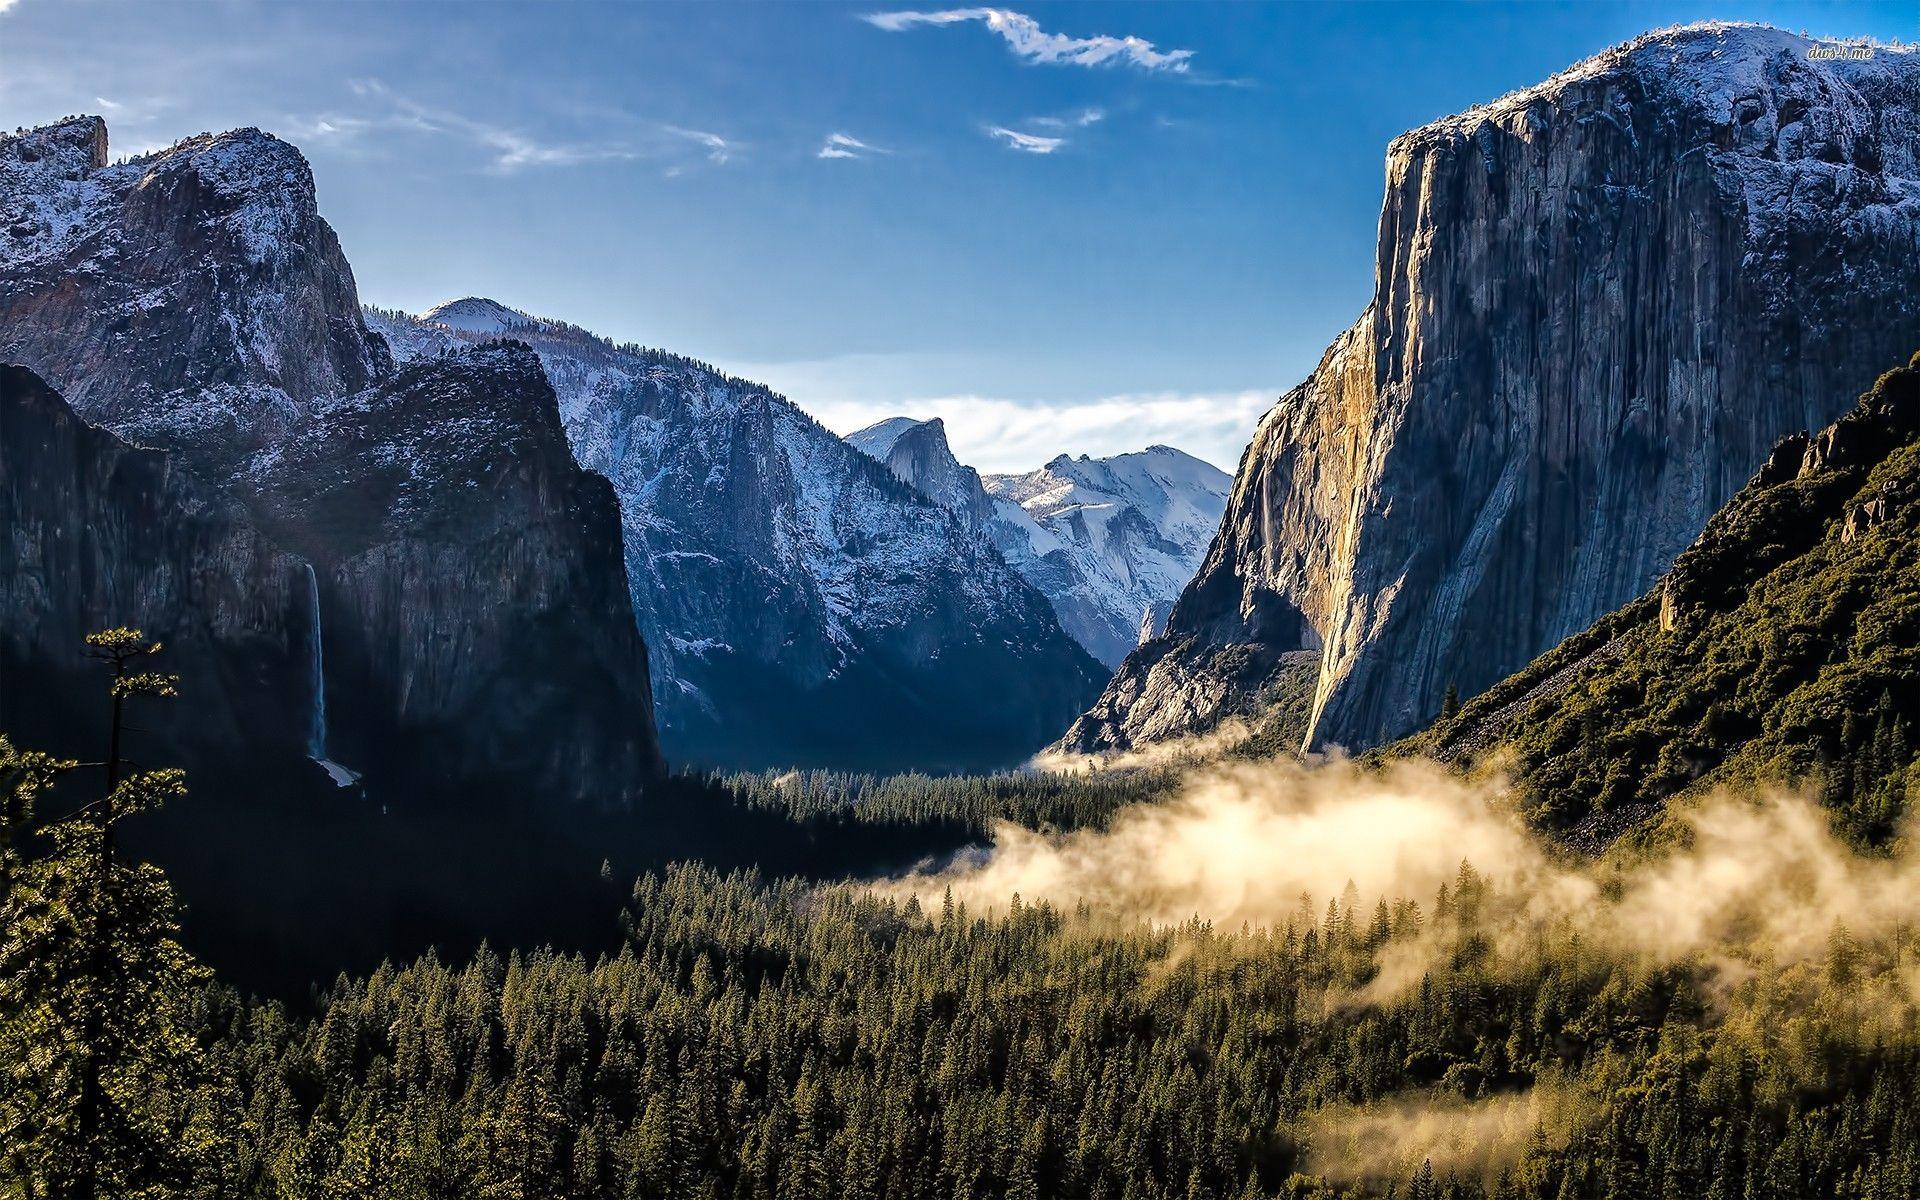 Download Wallpaper Macbook Yosemite - 3f1f808983b46a1f47028f1e7d193159  Pic_419387.jpg